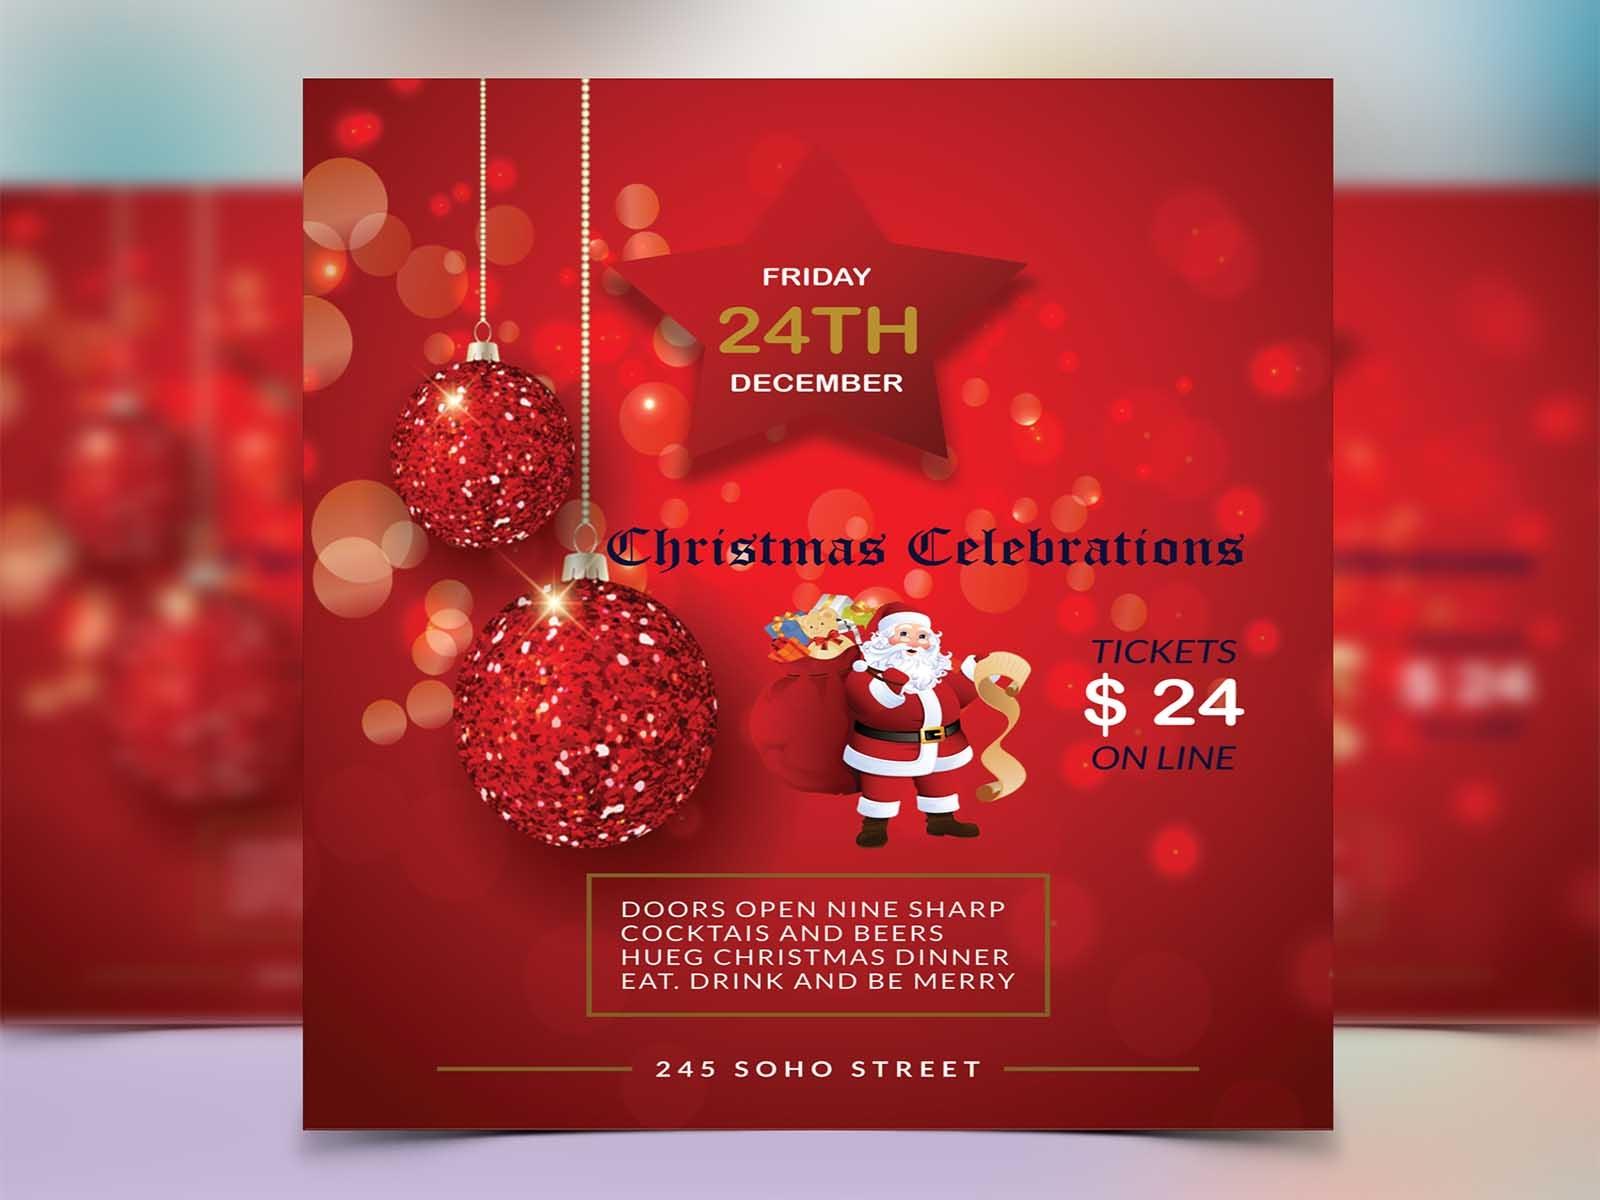 Christmas Flyer.Christmas Flyer By Gowrob Sarkar On Dribbble